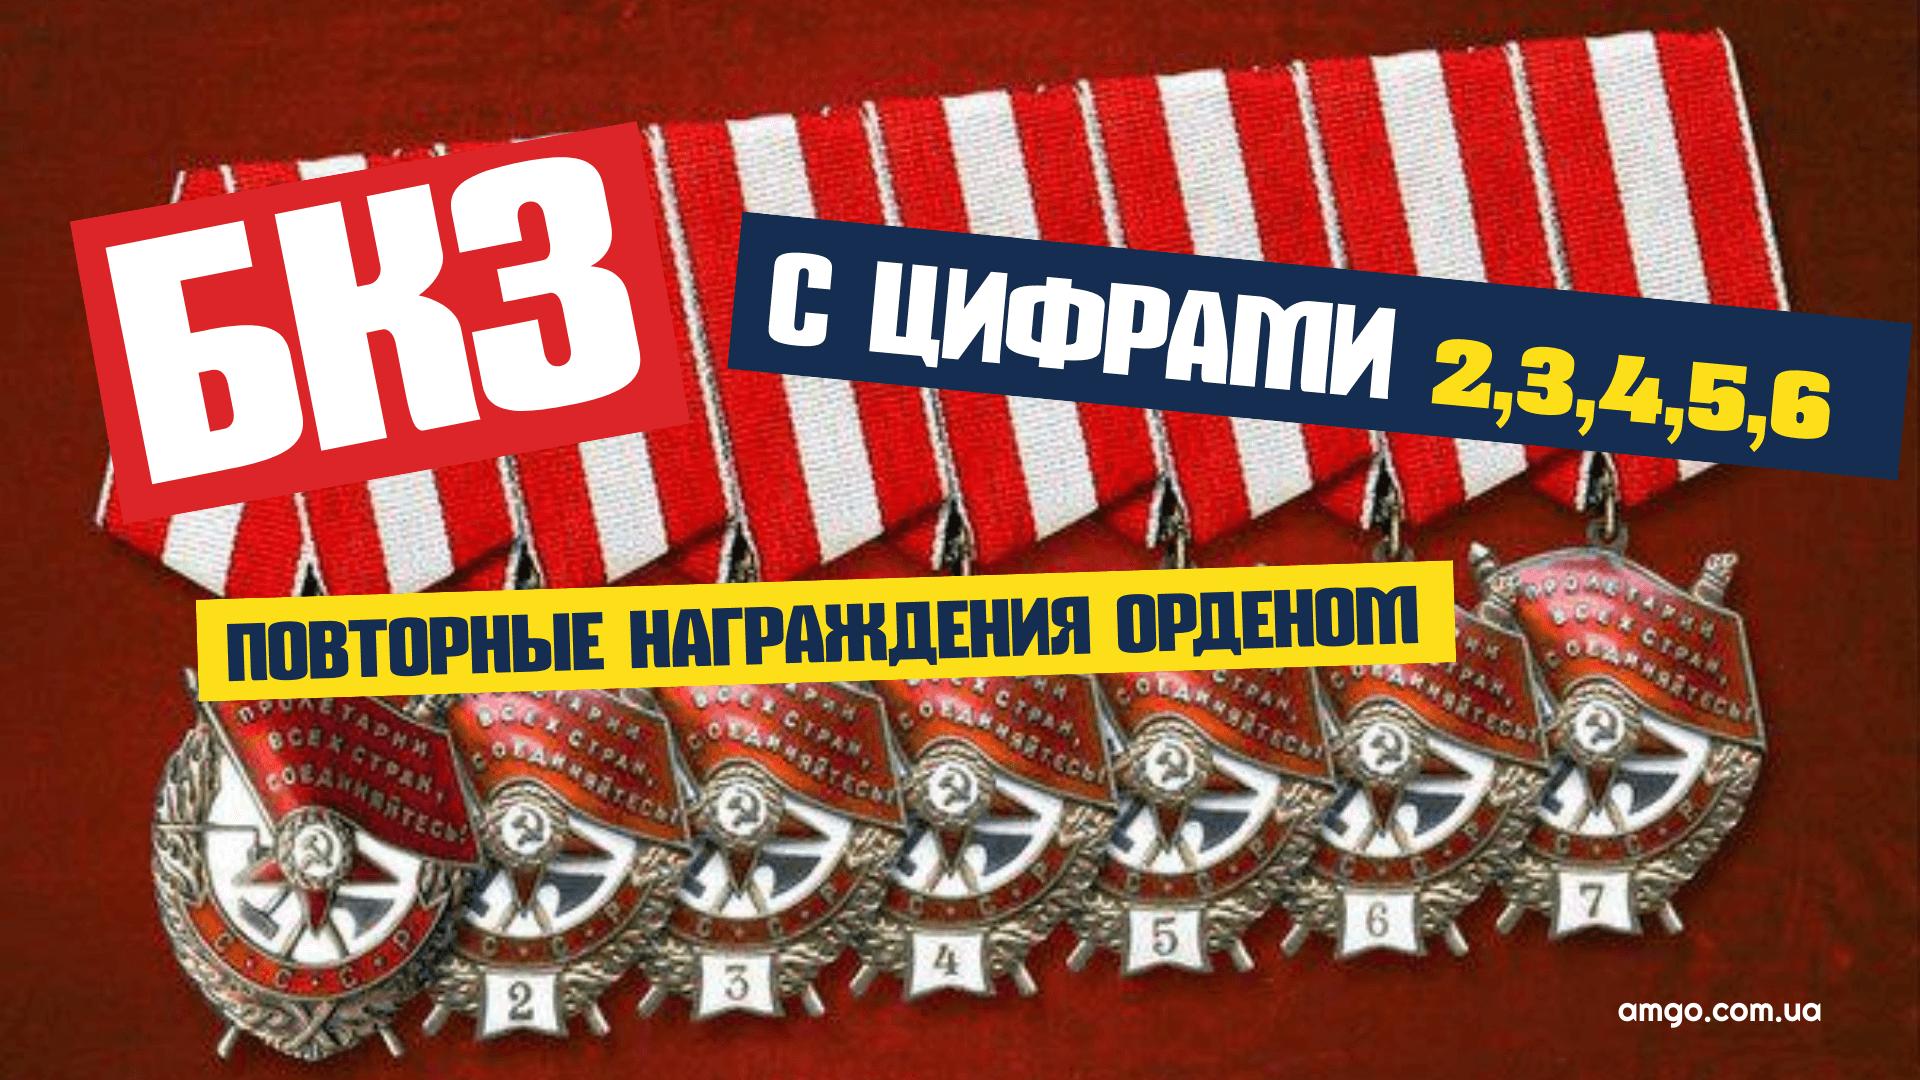 орден боевого красного знамени с цифрами